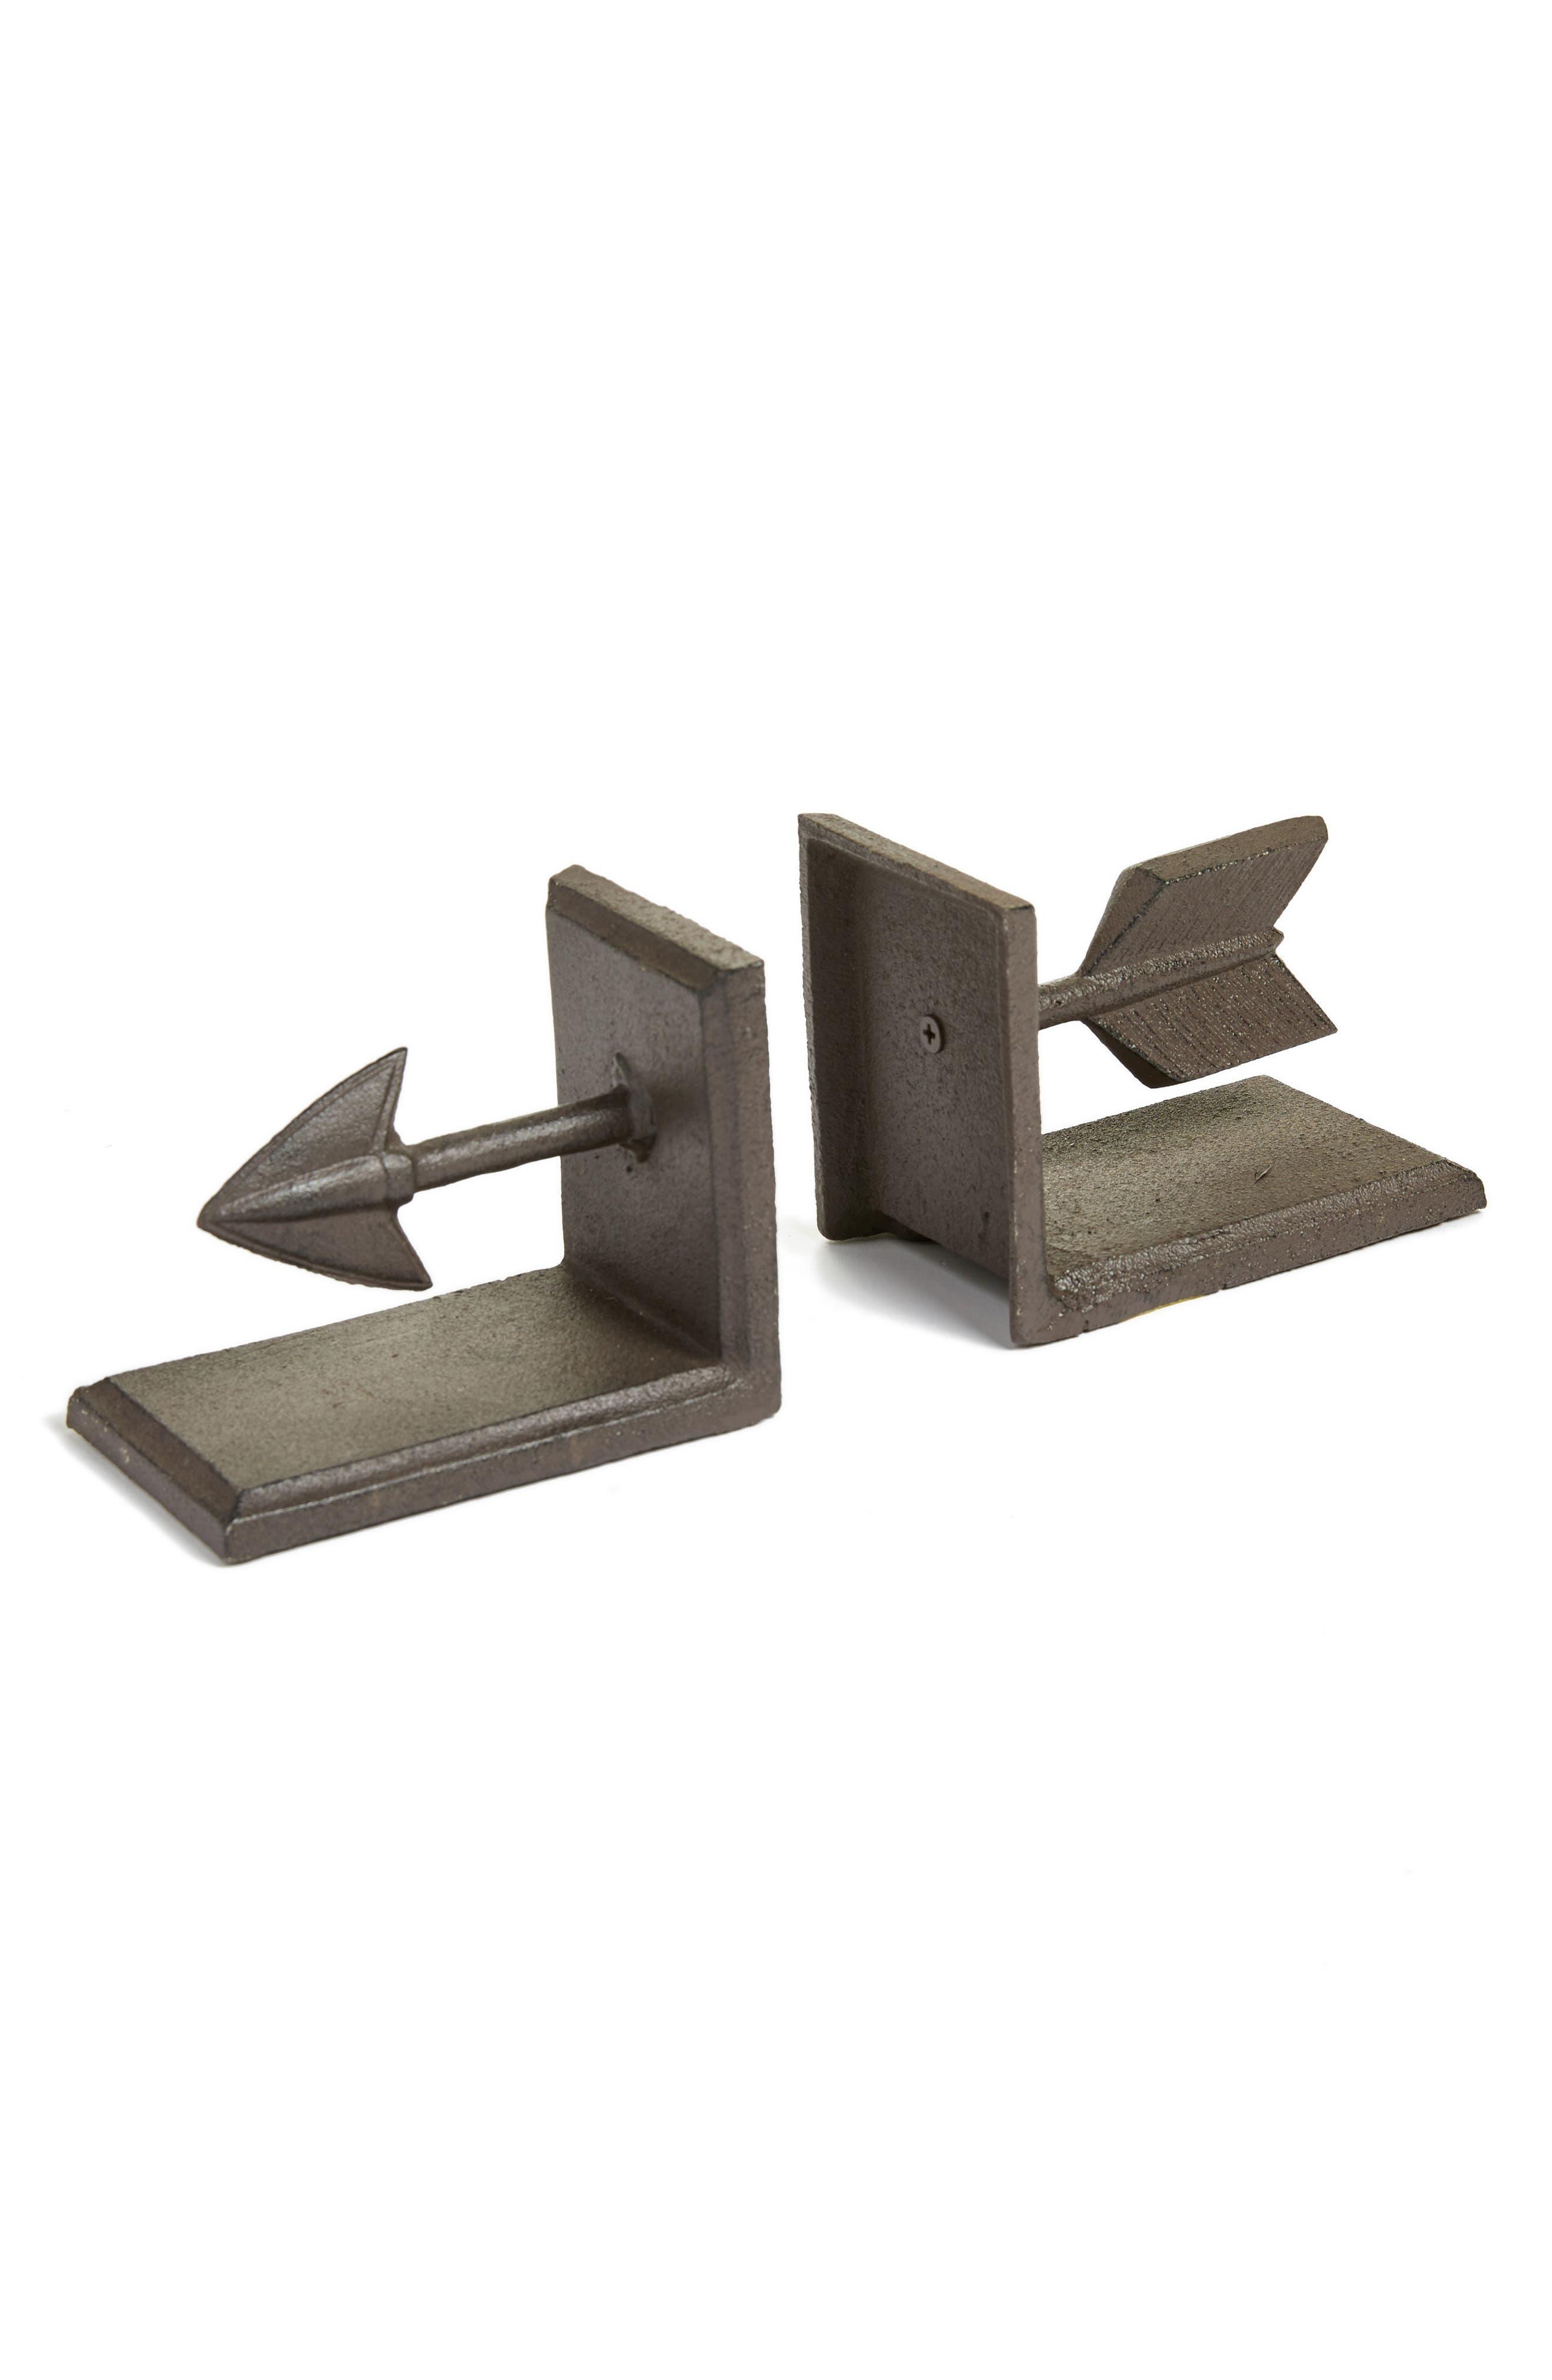 HomArt Set of 2 Arrow Bookends